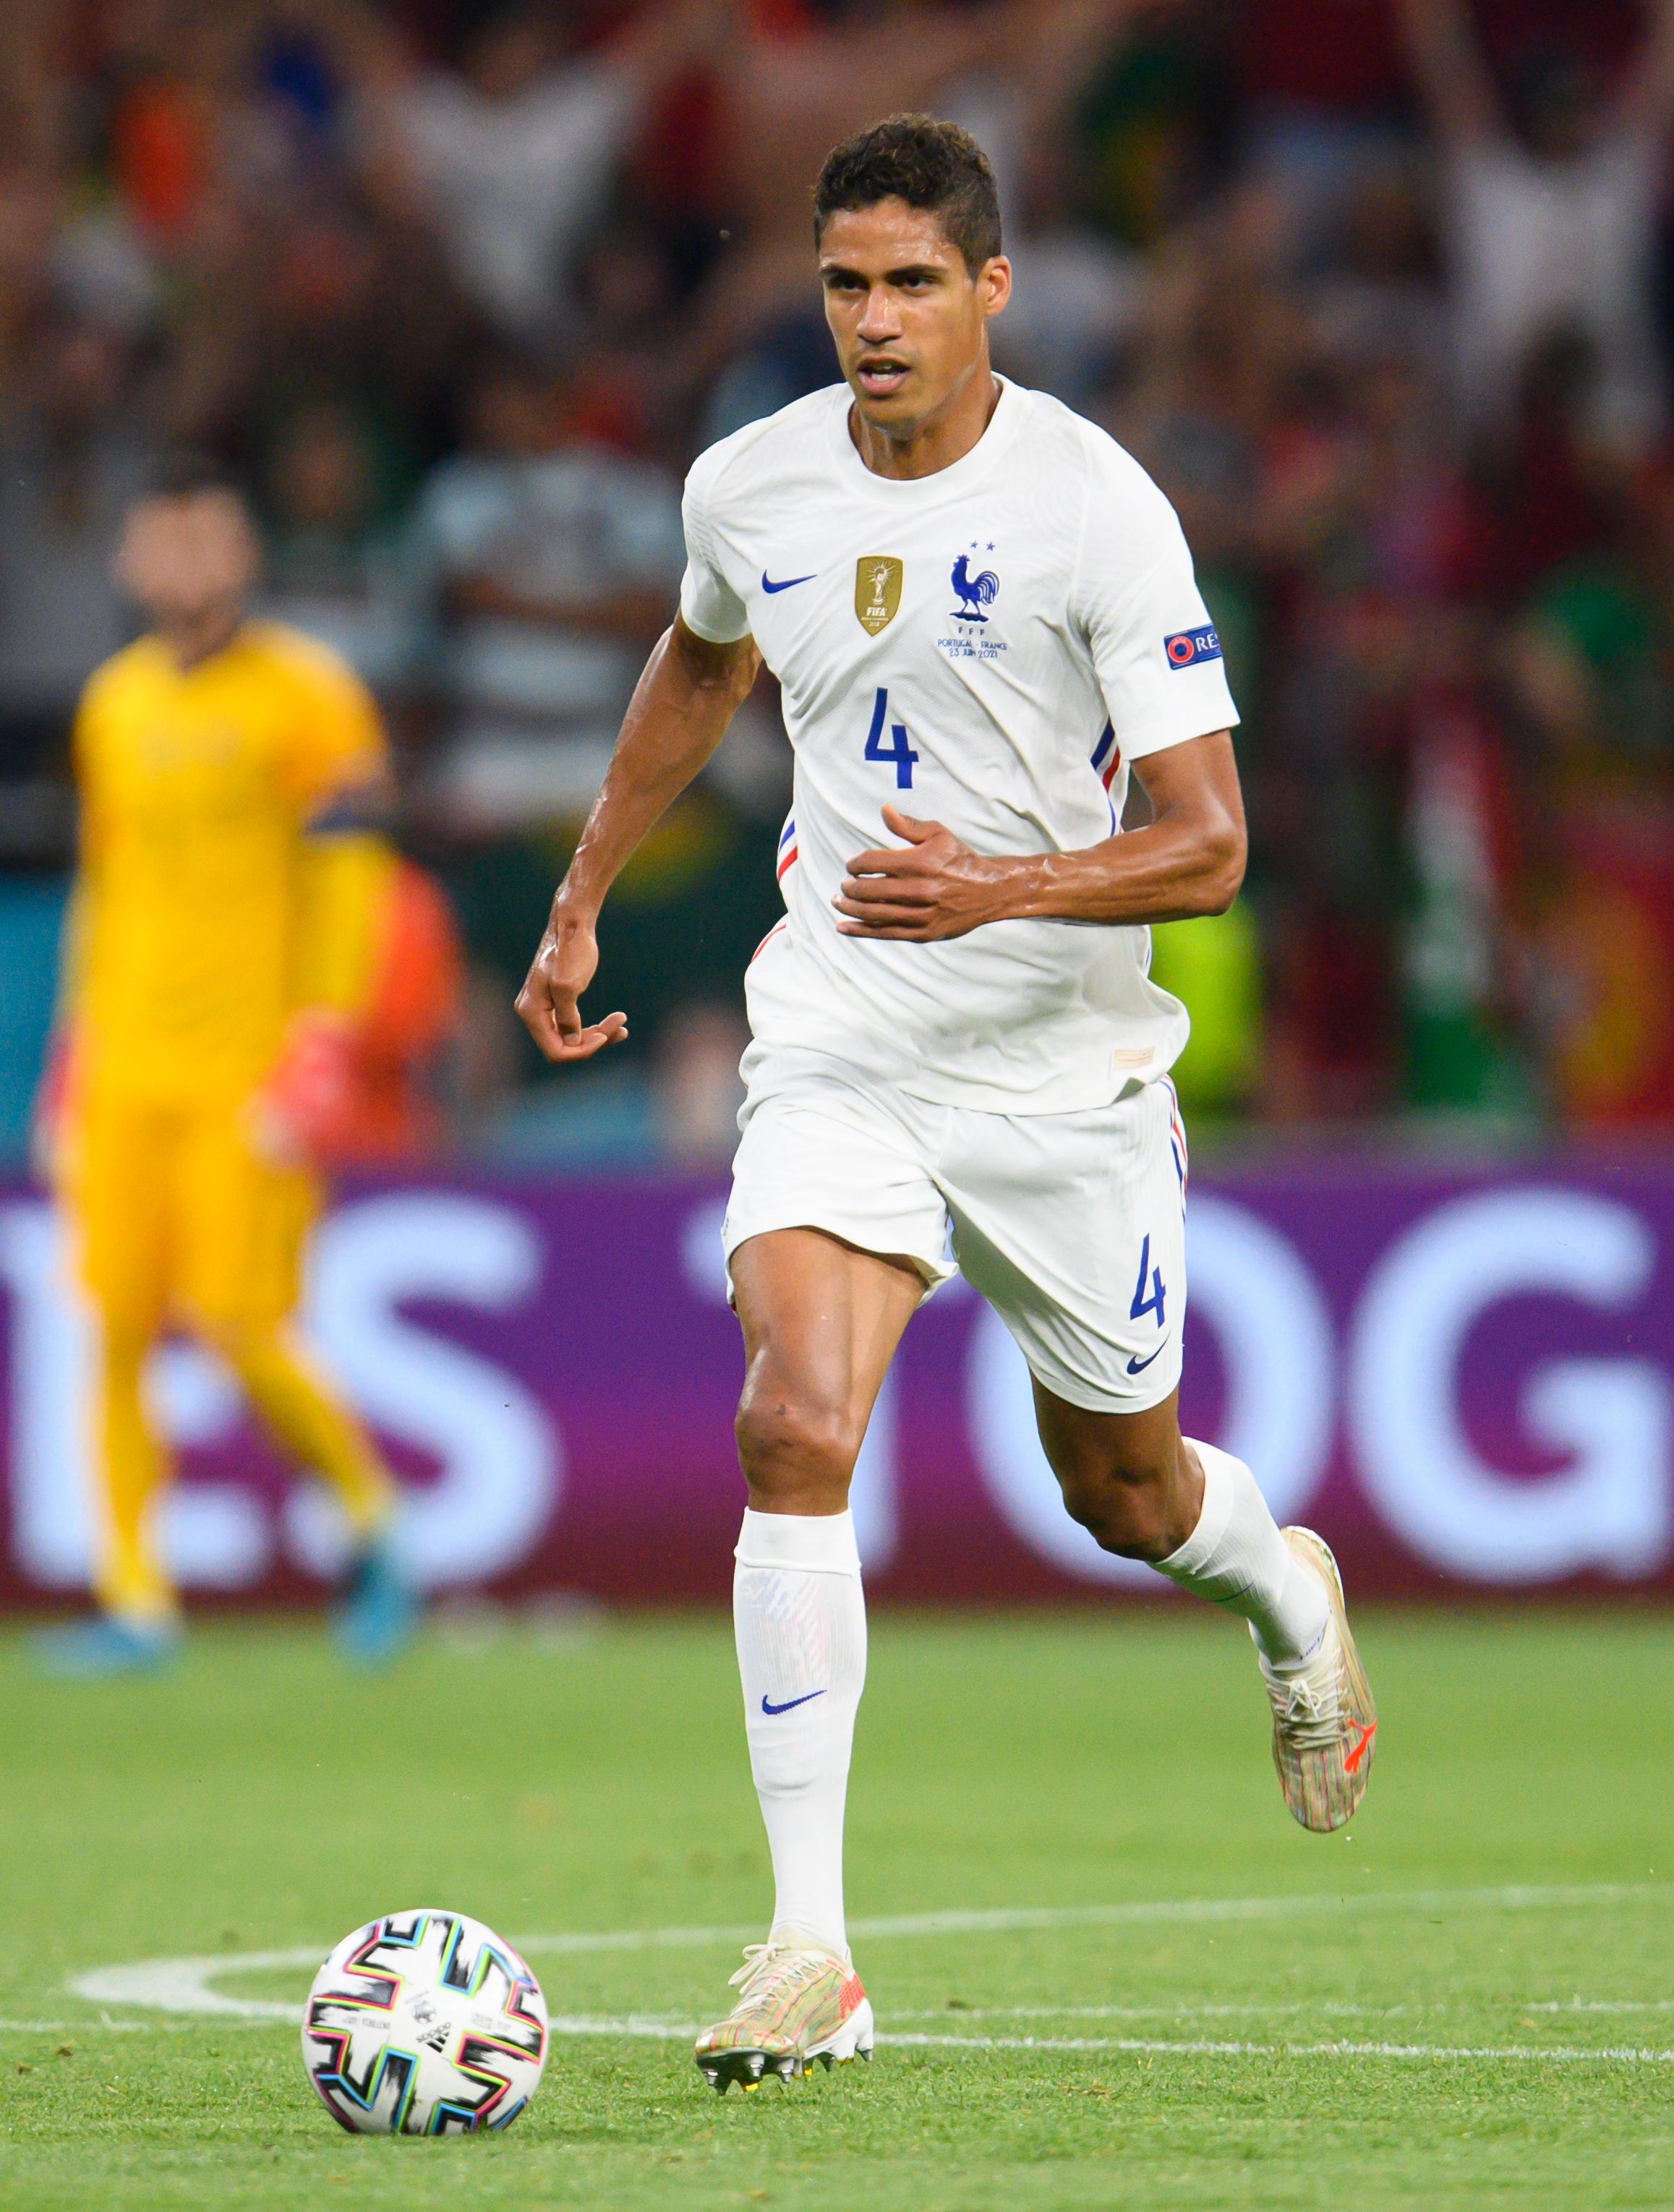 European Football Championship - Portugal - France